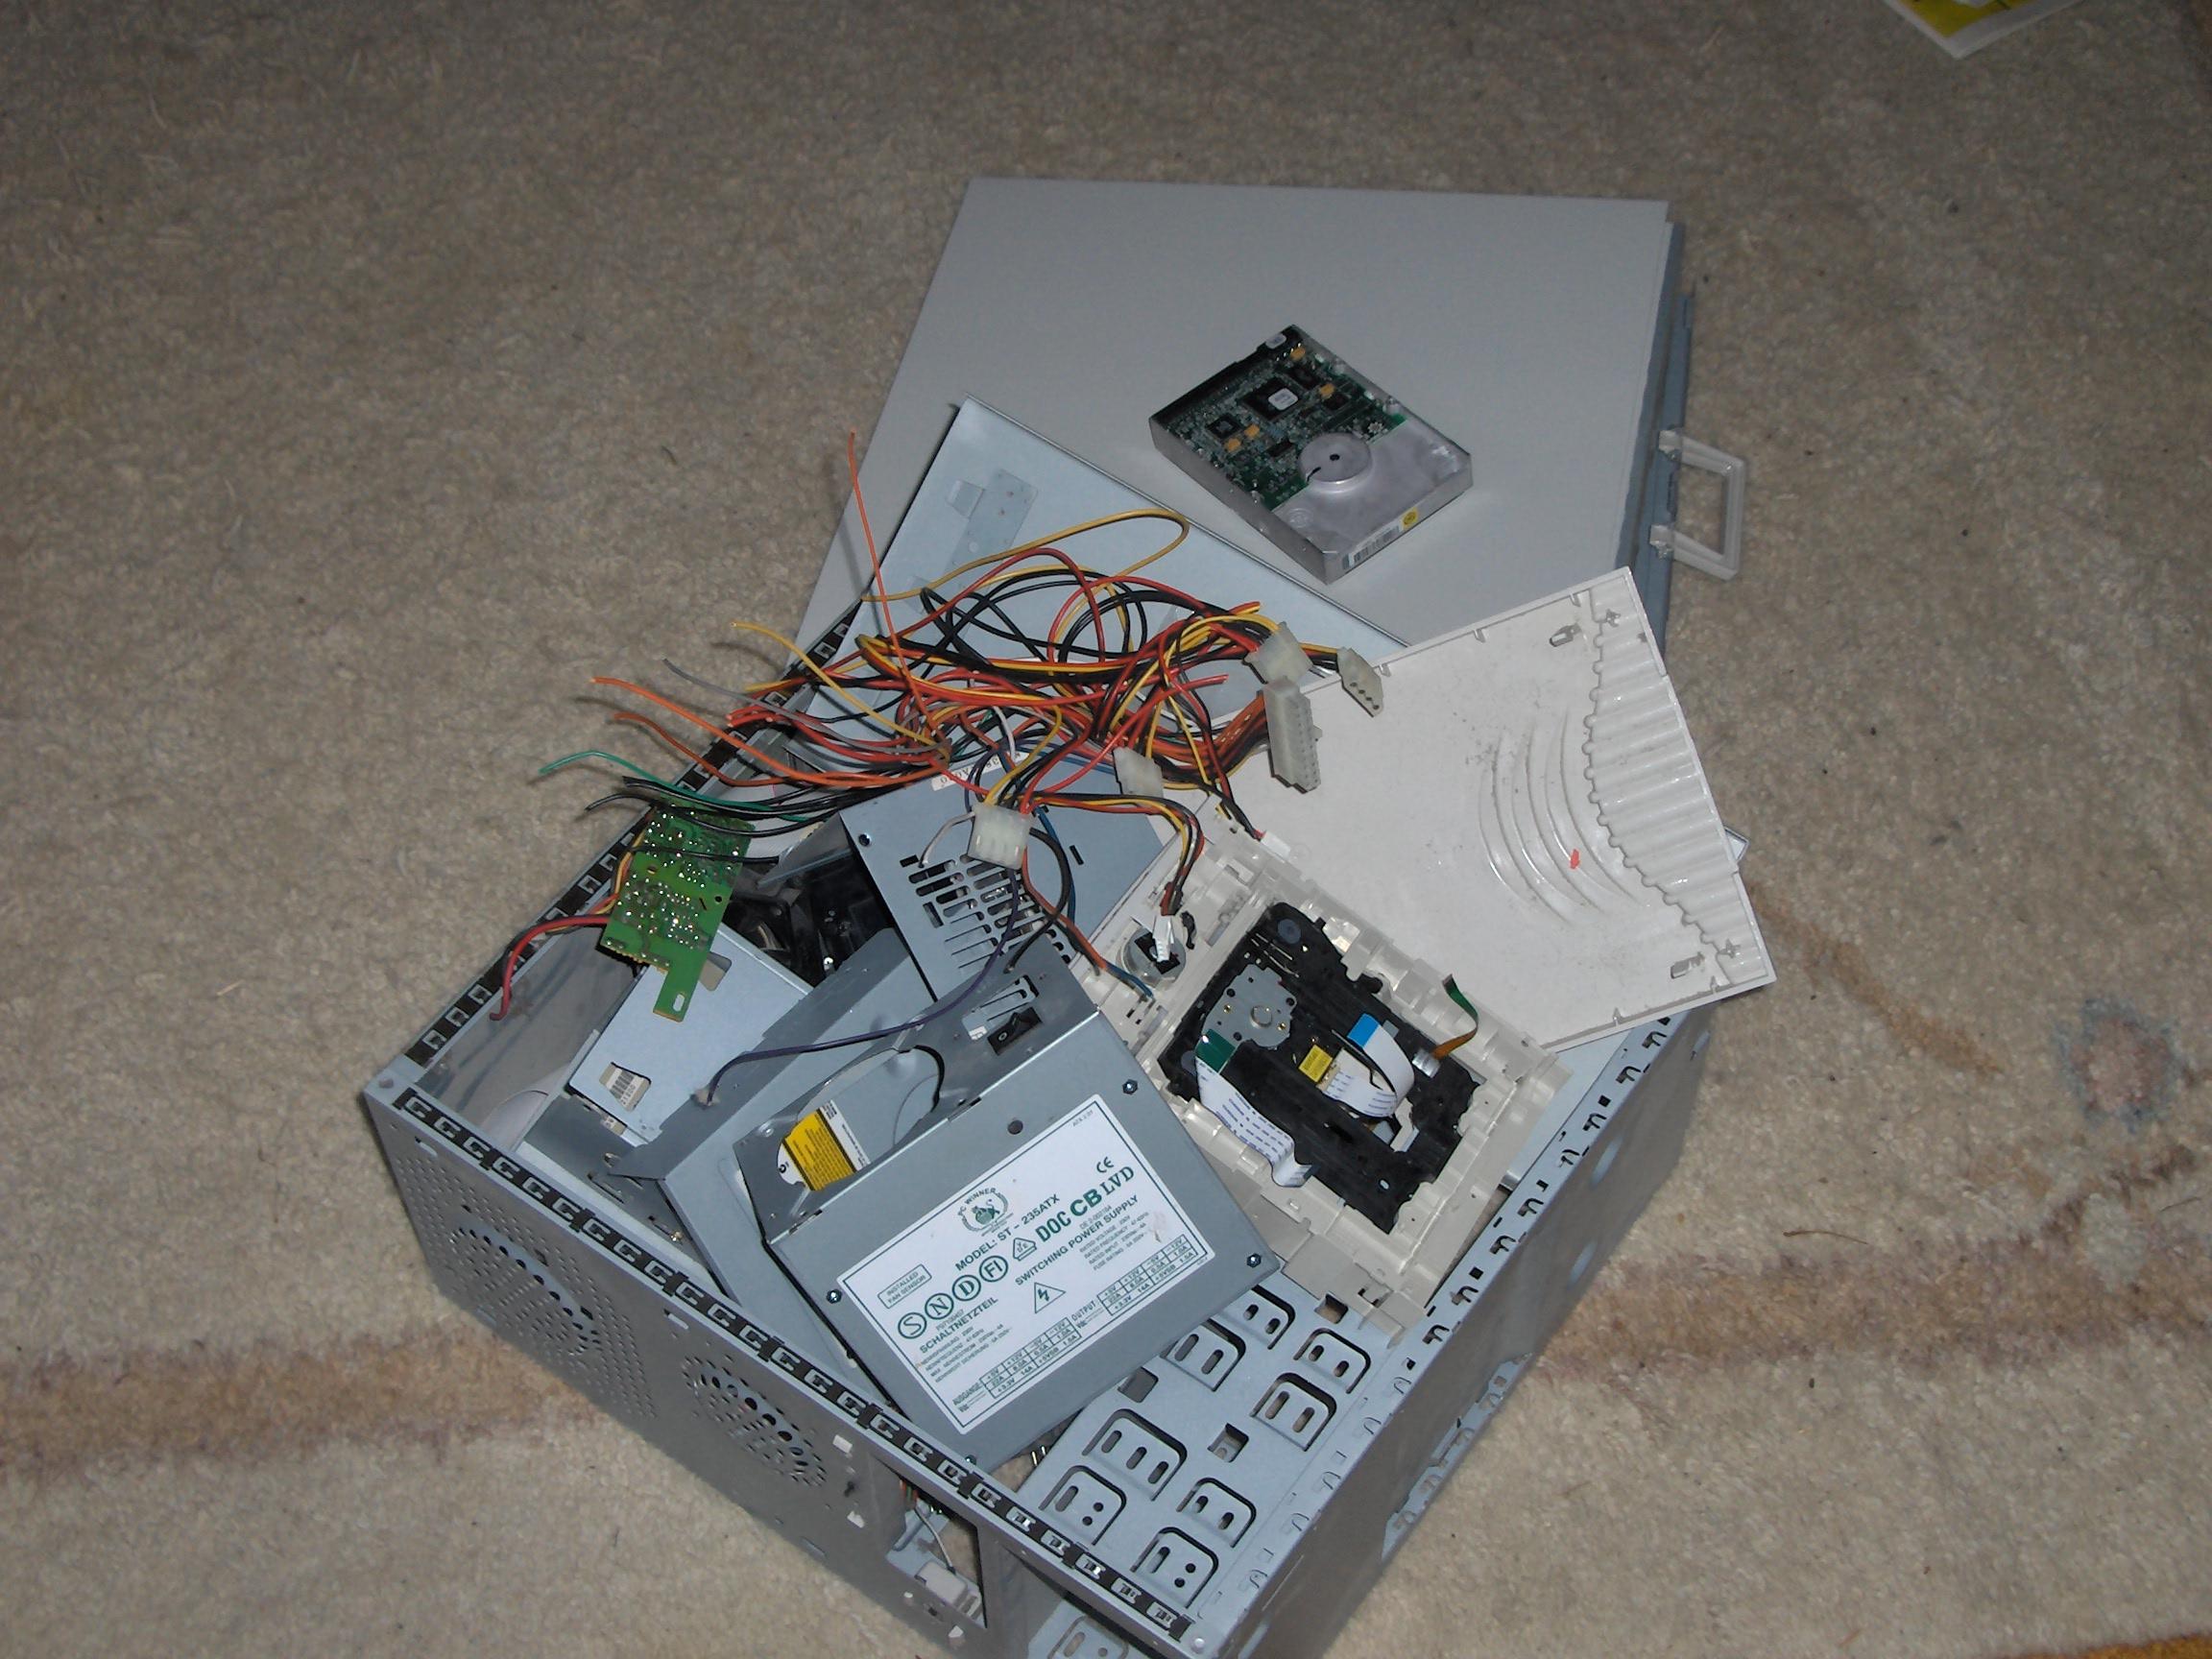 Festplatte vor Zertrümmerung